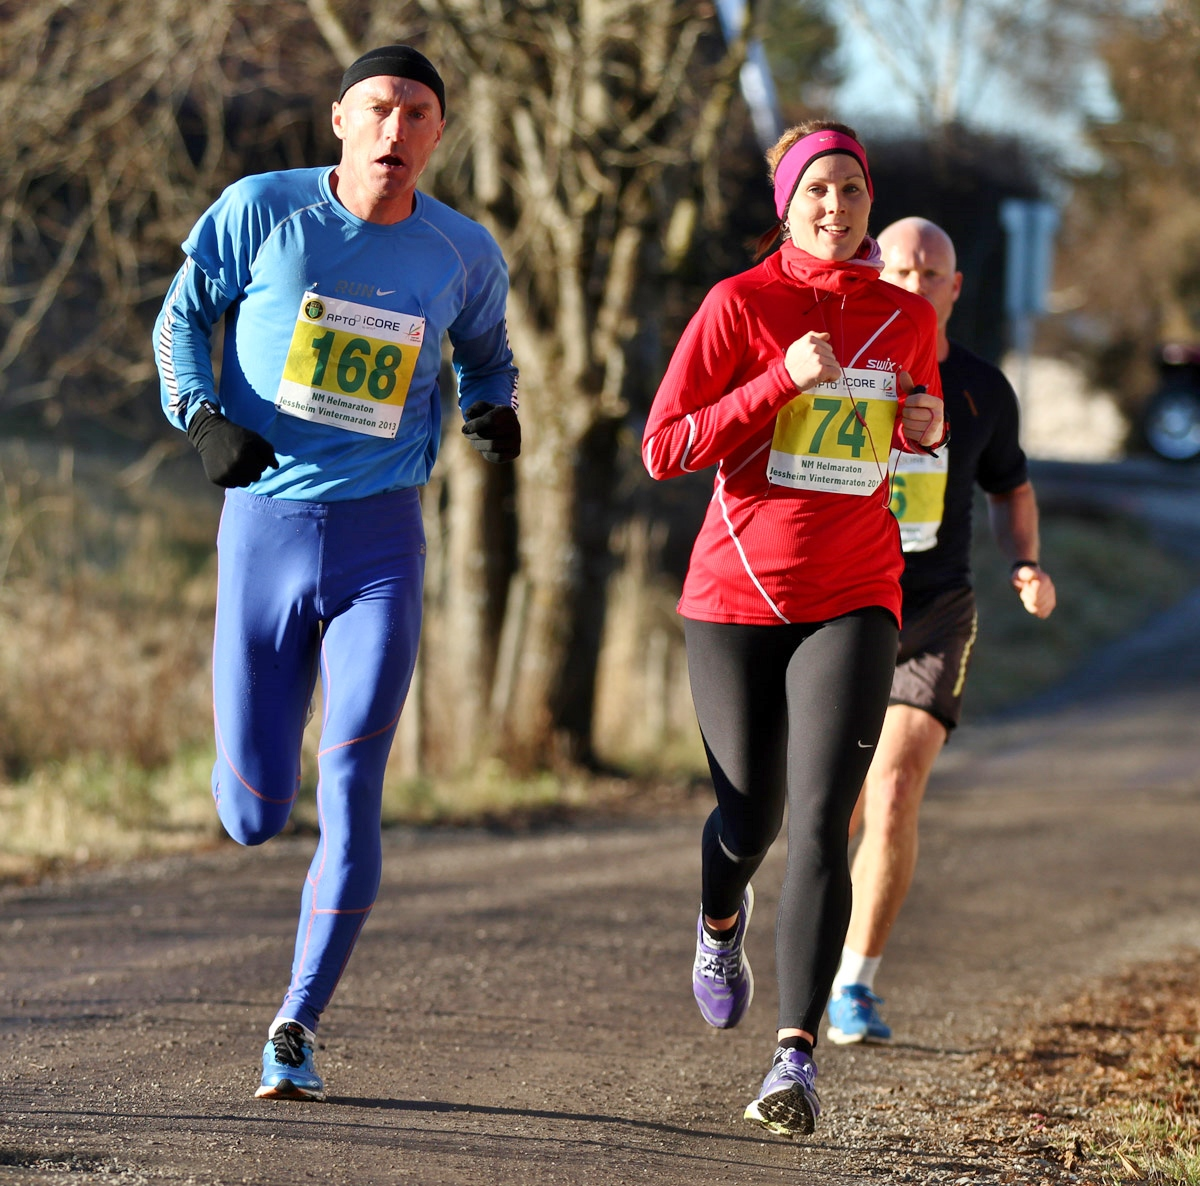 Vintermaraton2013_Audun-Skogen_Maria-Venaas_8km.jpg